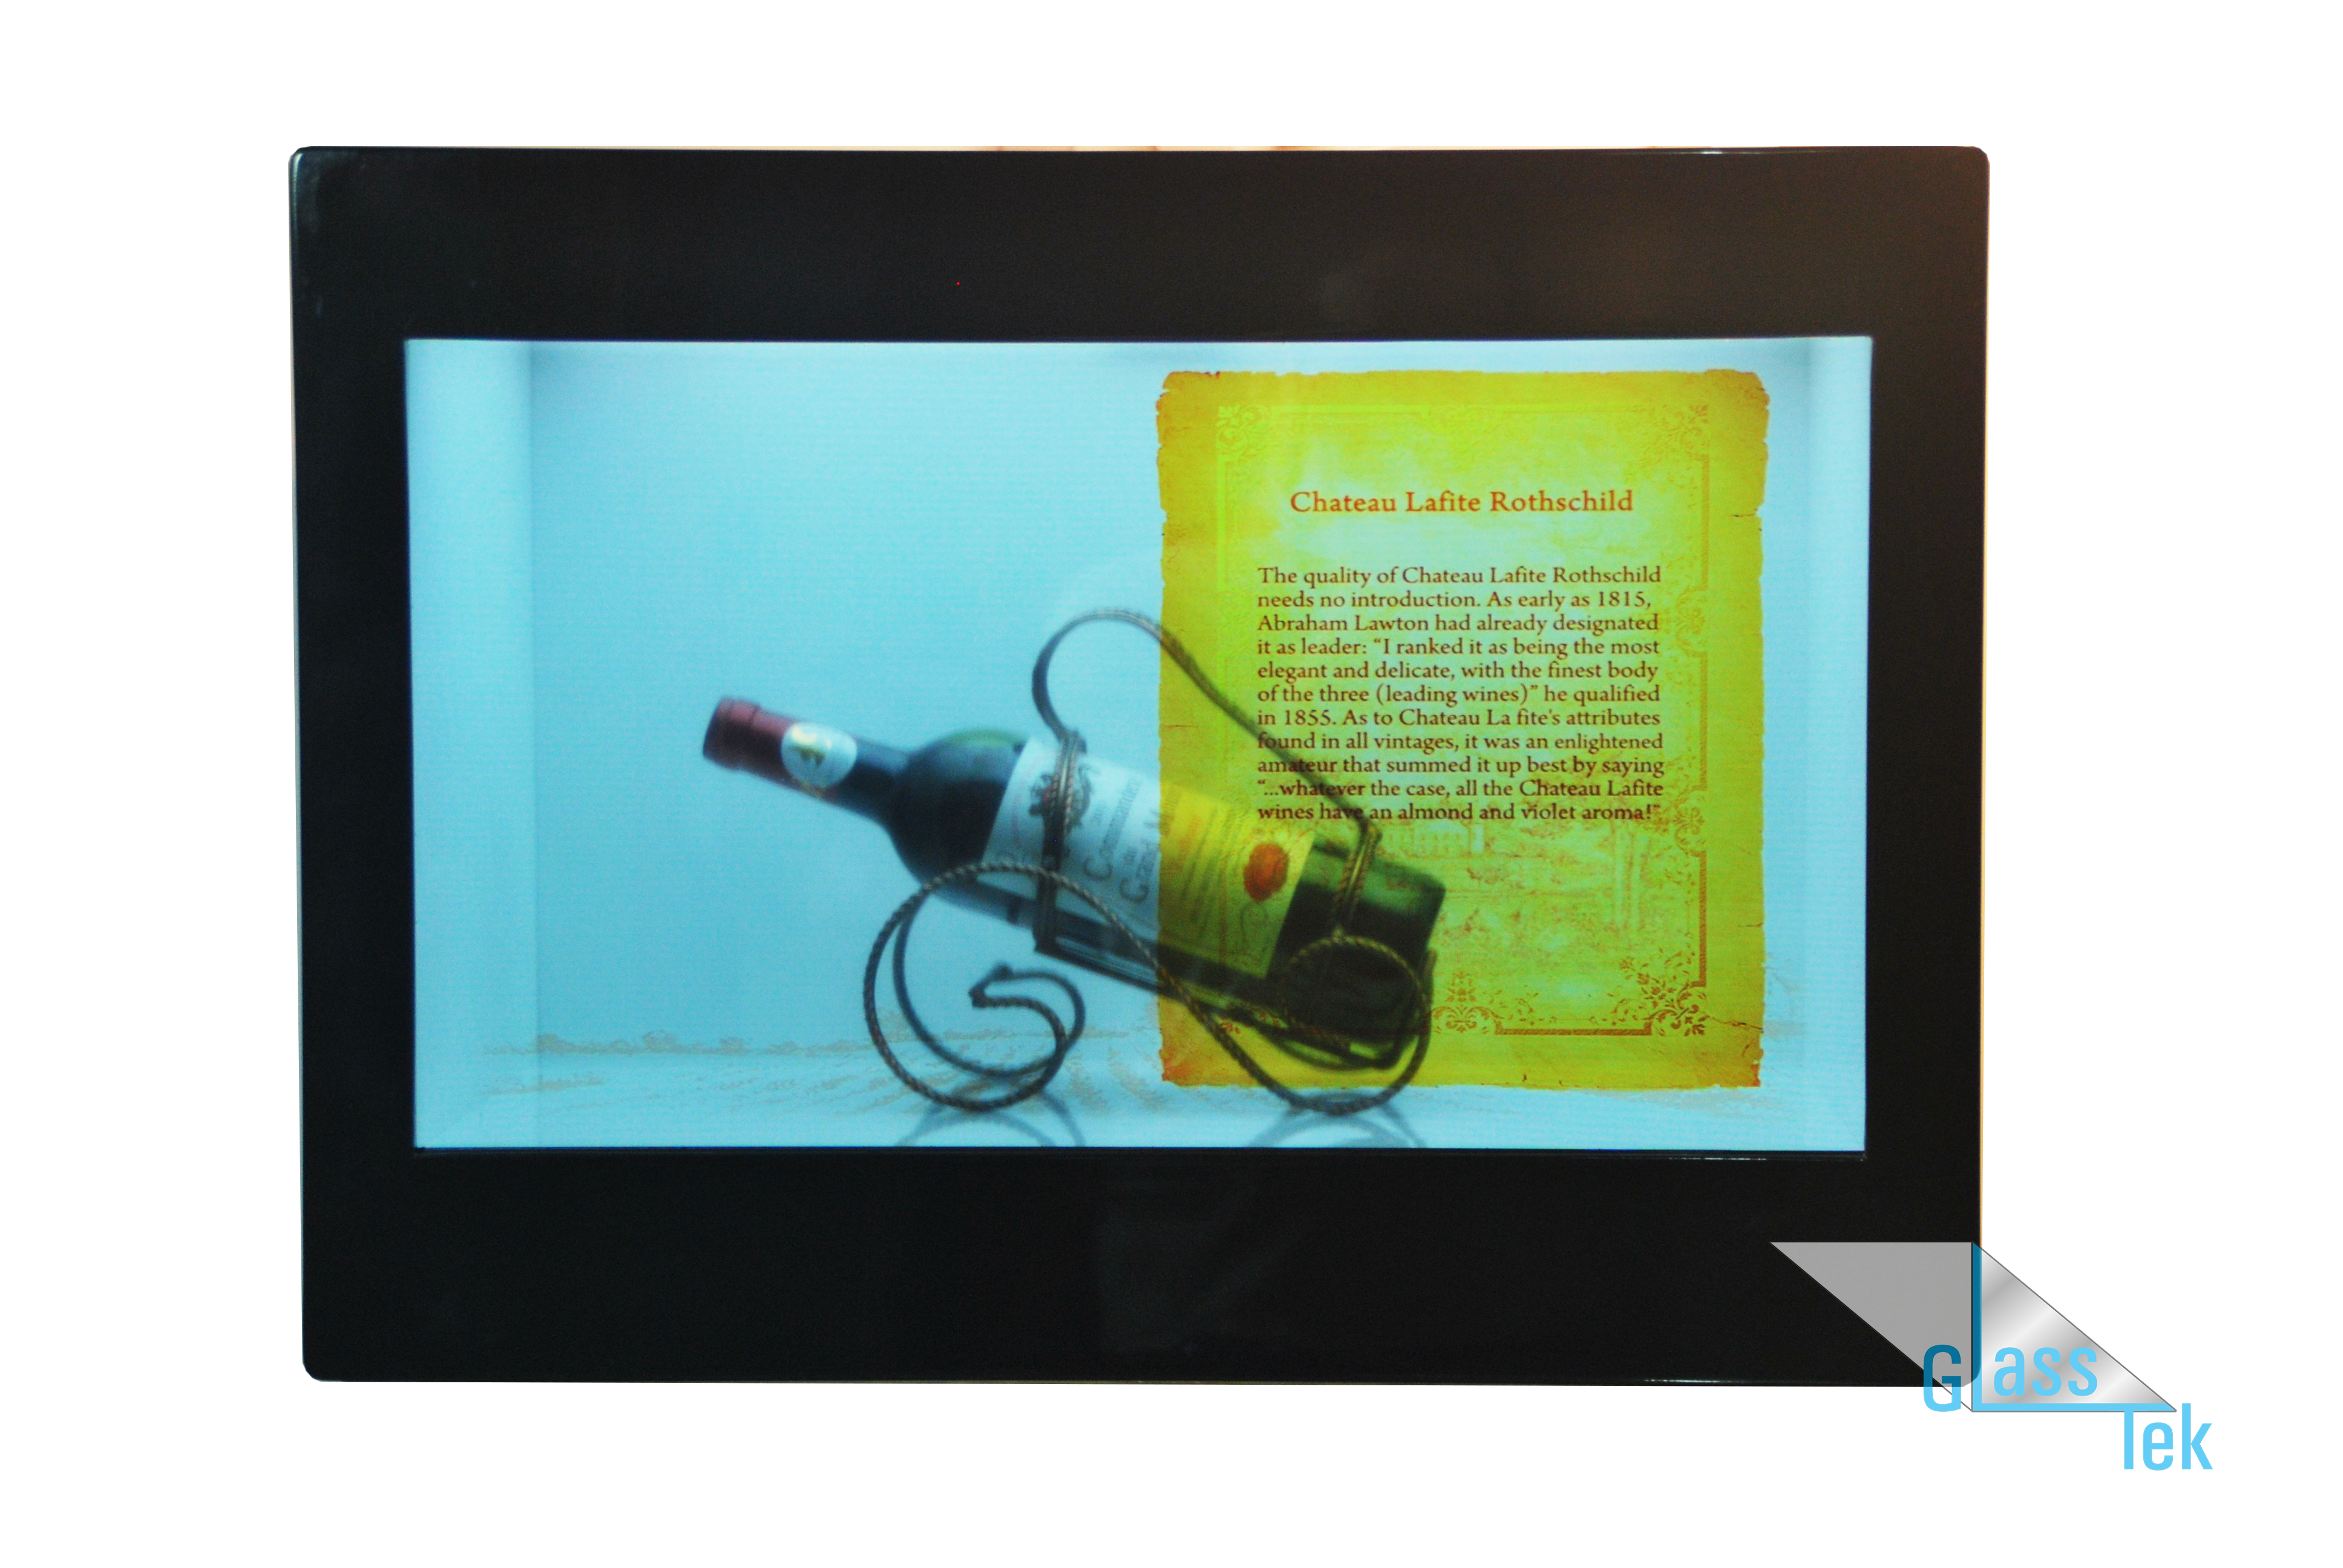 Big Black Box with Wine Display